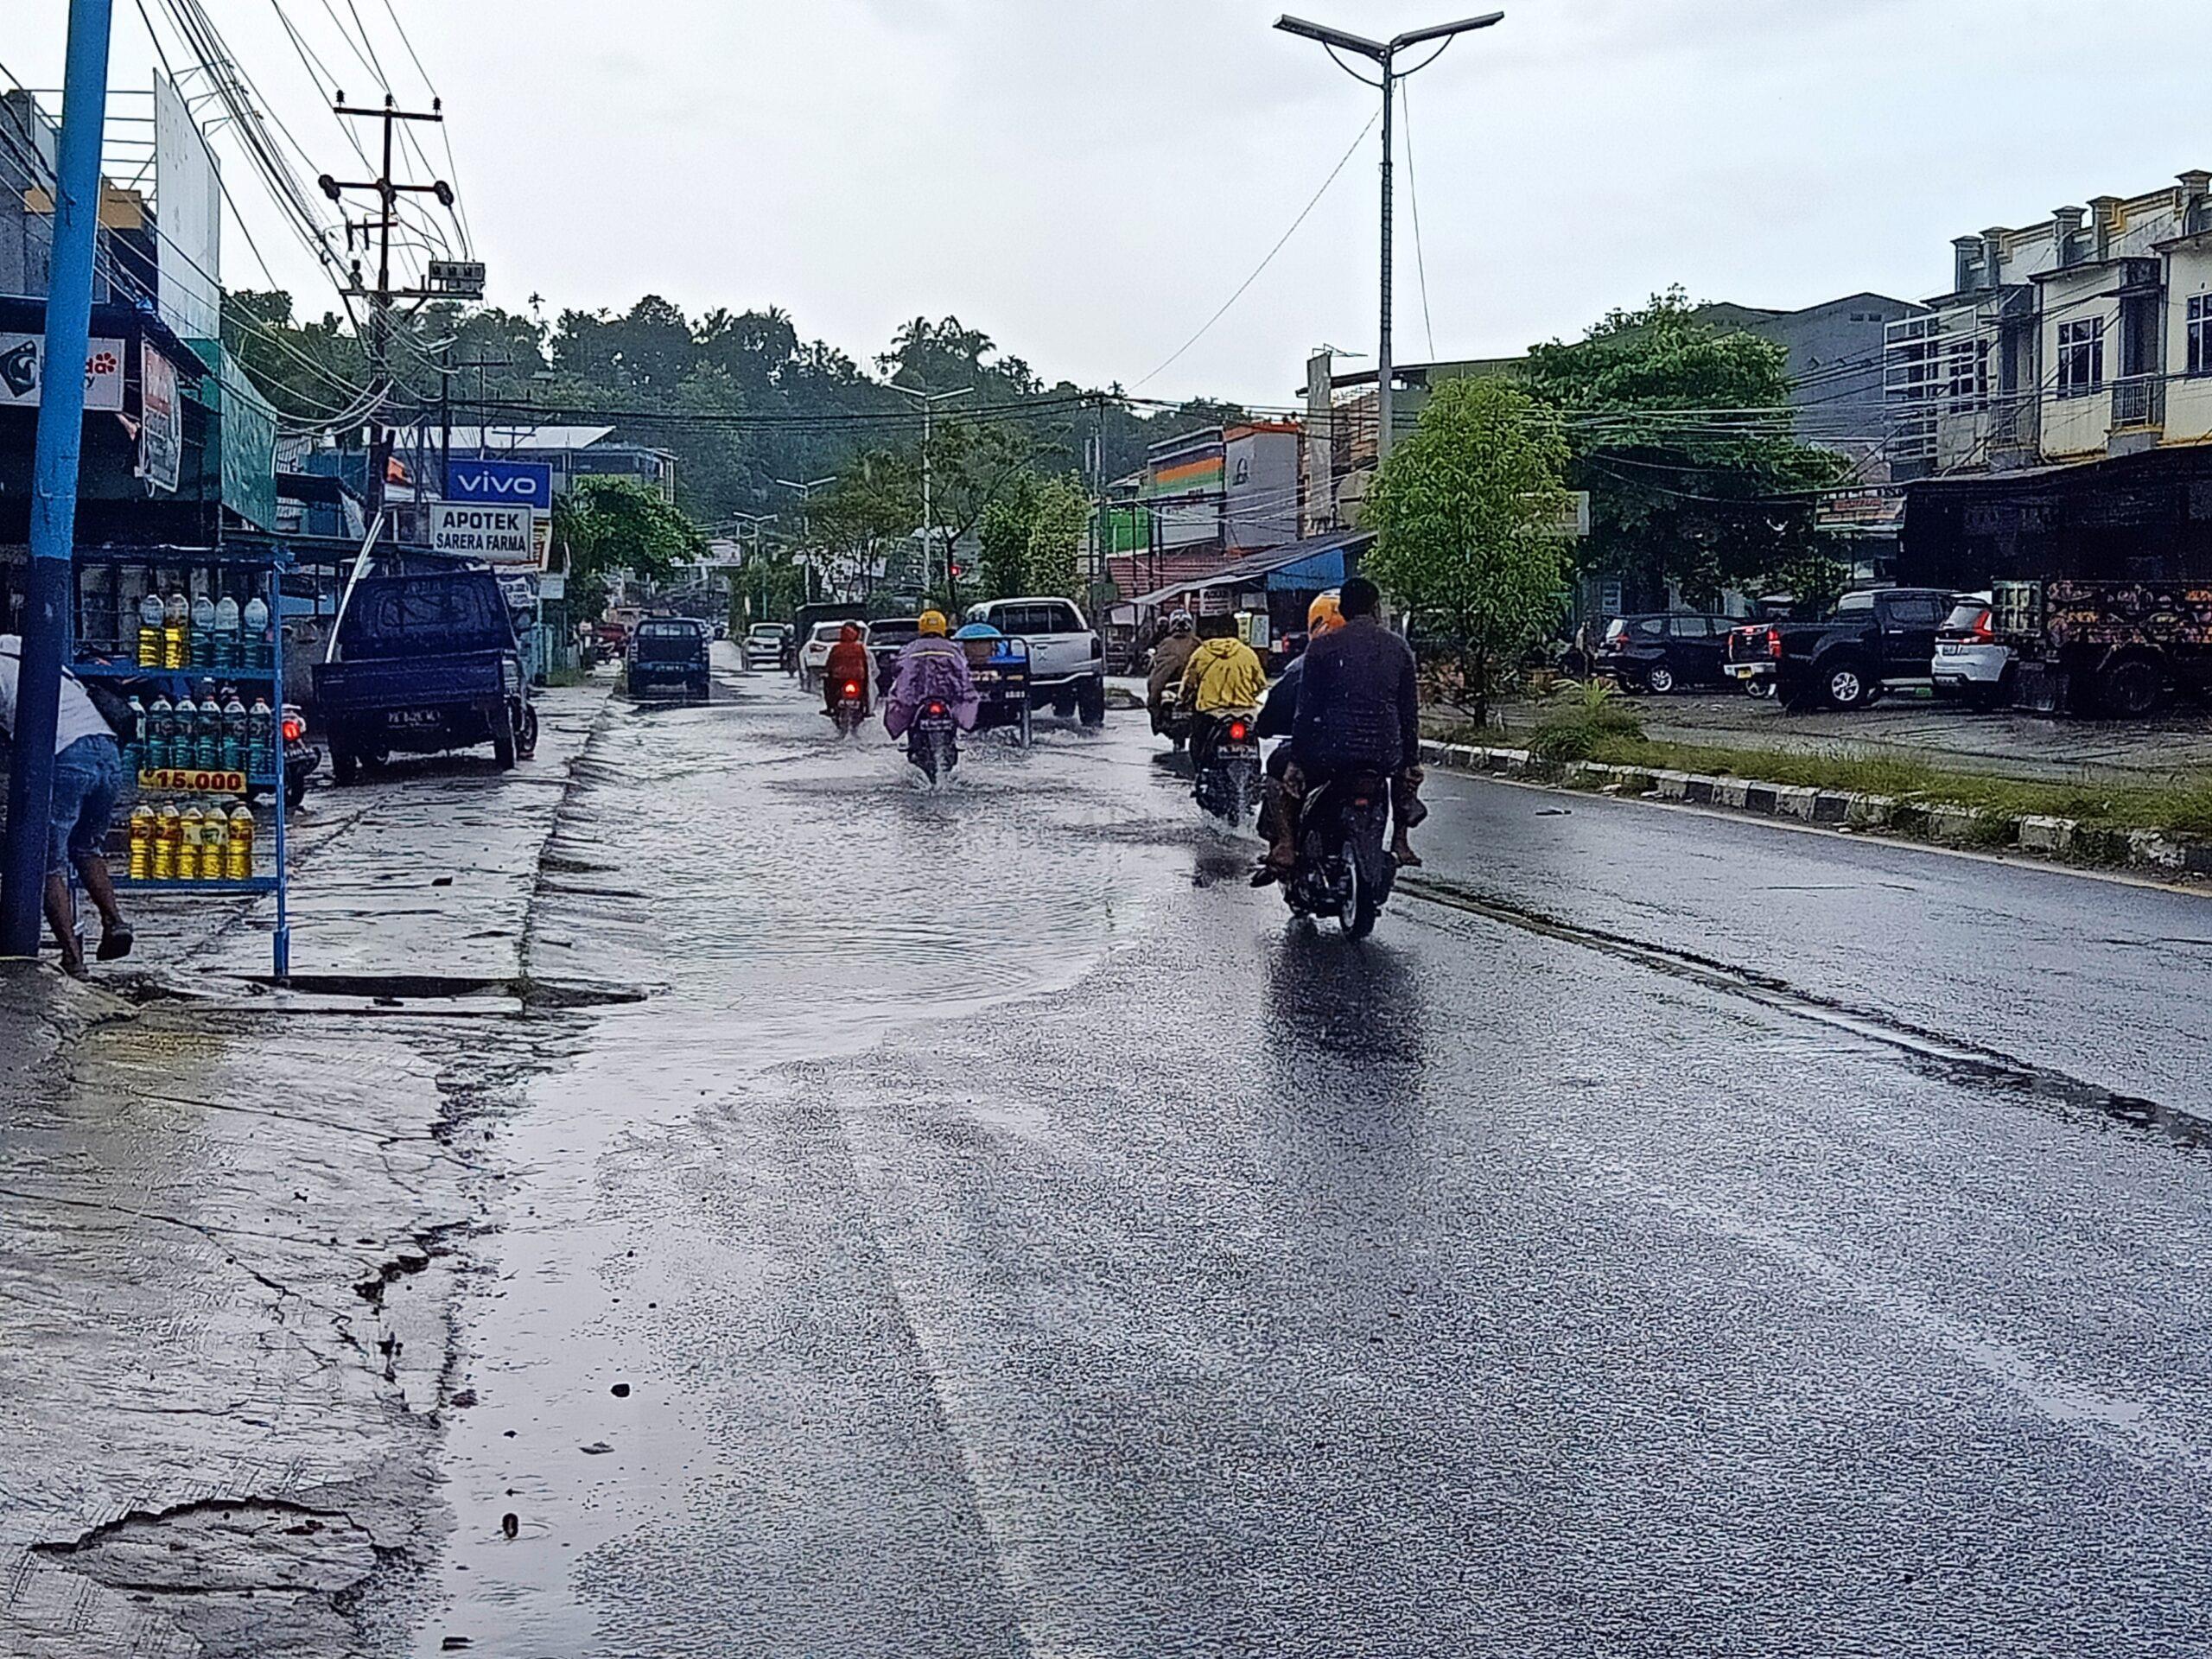 Manokwari Hujan Deras Disertai Petir dan Guntur 25 IMG 20210206 153513 scaled